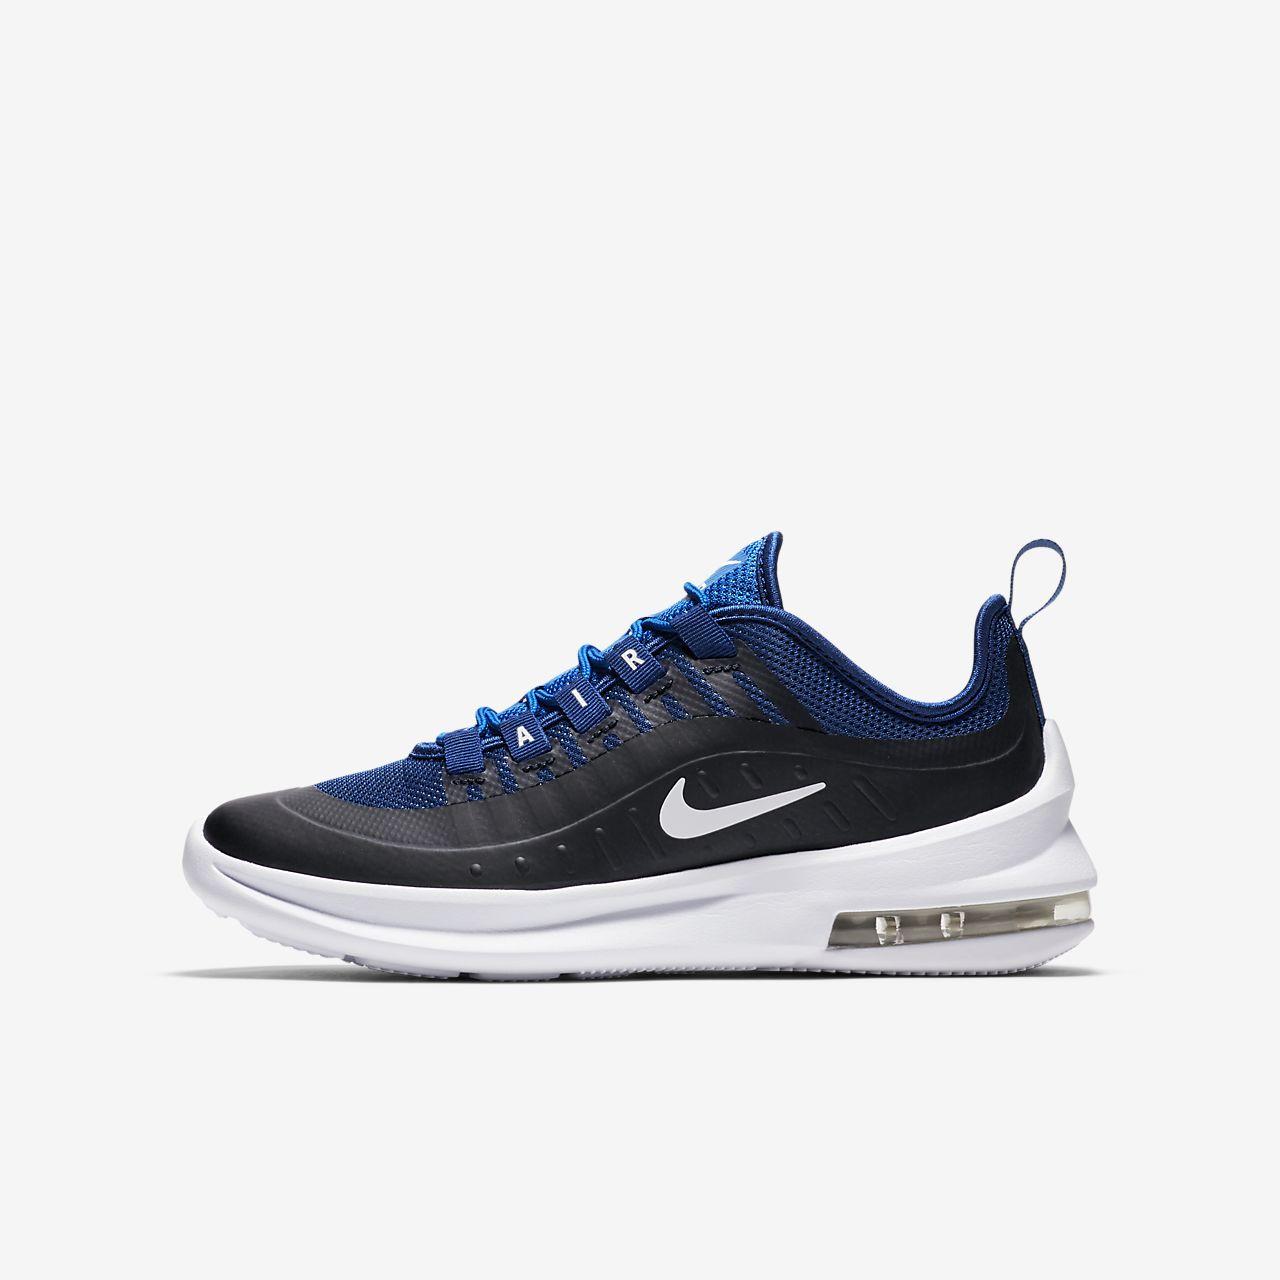 ... Nike Air Max Axis Older Kids' Shoe